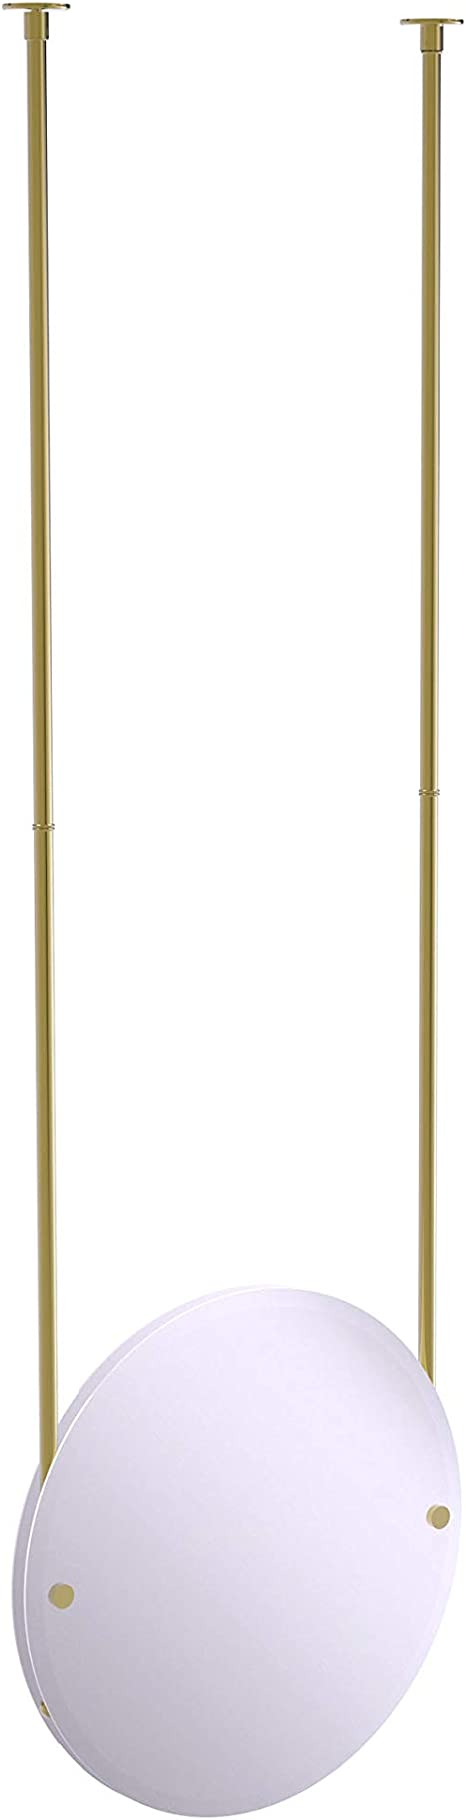 Amazon Com Allied Brass Frameless Round Beveled Edge Ceiling Hung Mirror Unlacquered Brass Home Kitchen